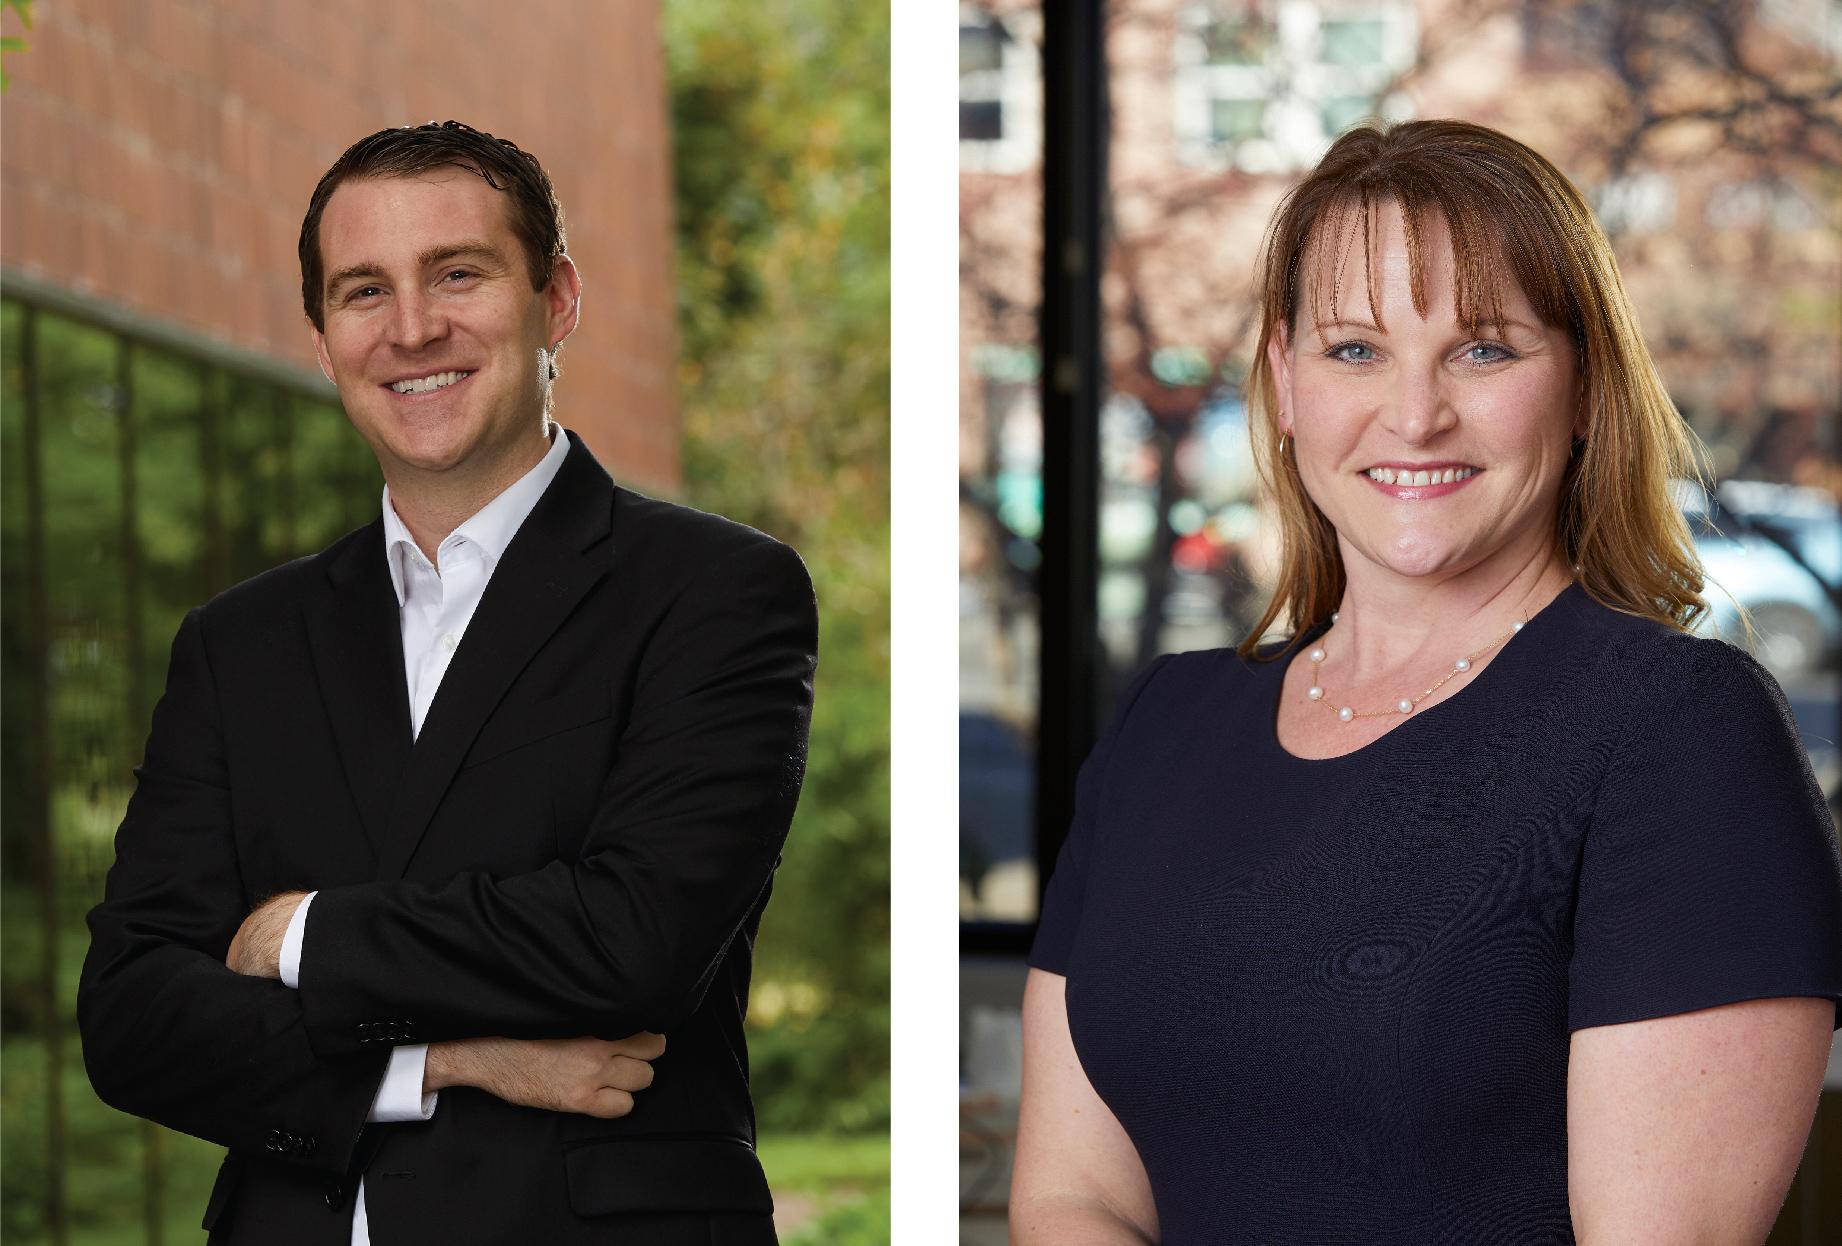 Brent Laird & Jennifer Cranford